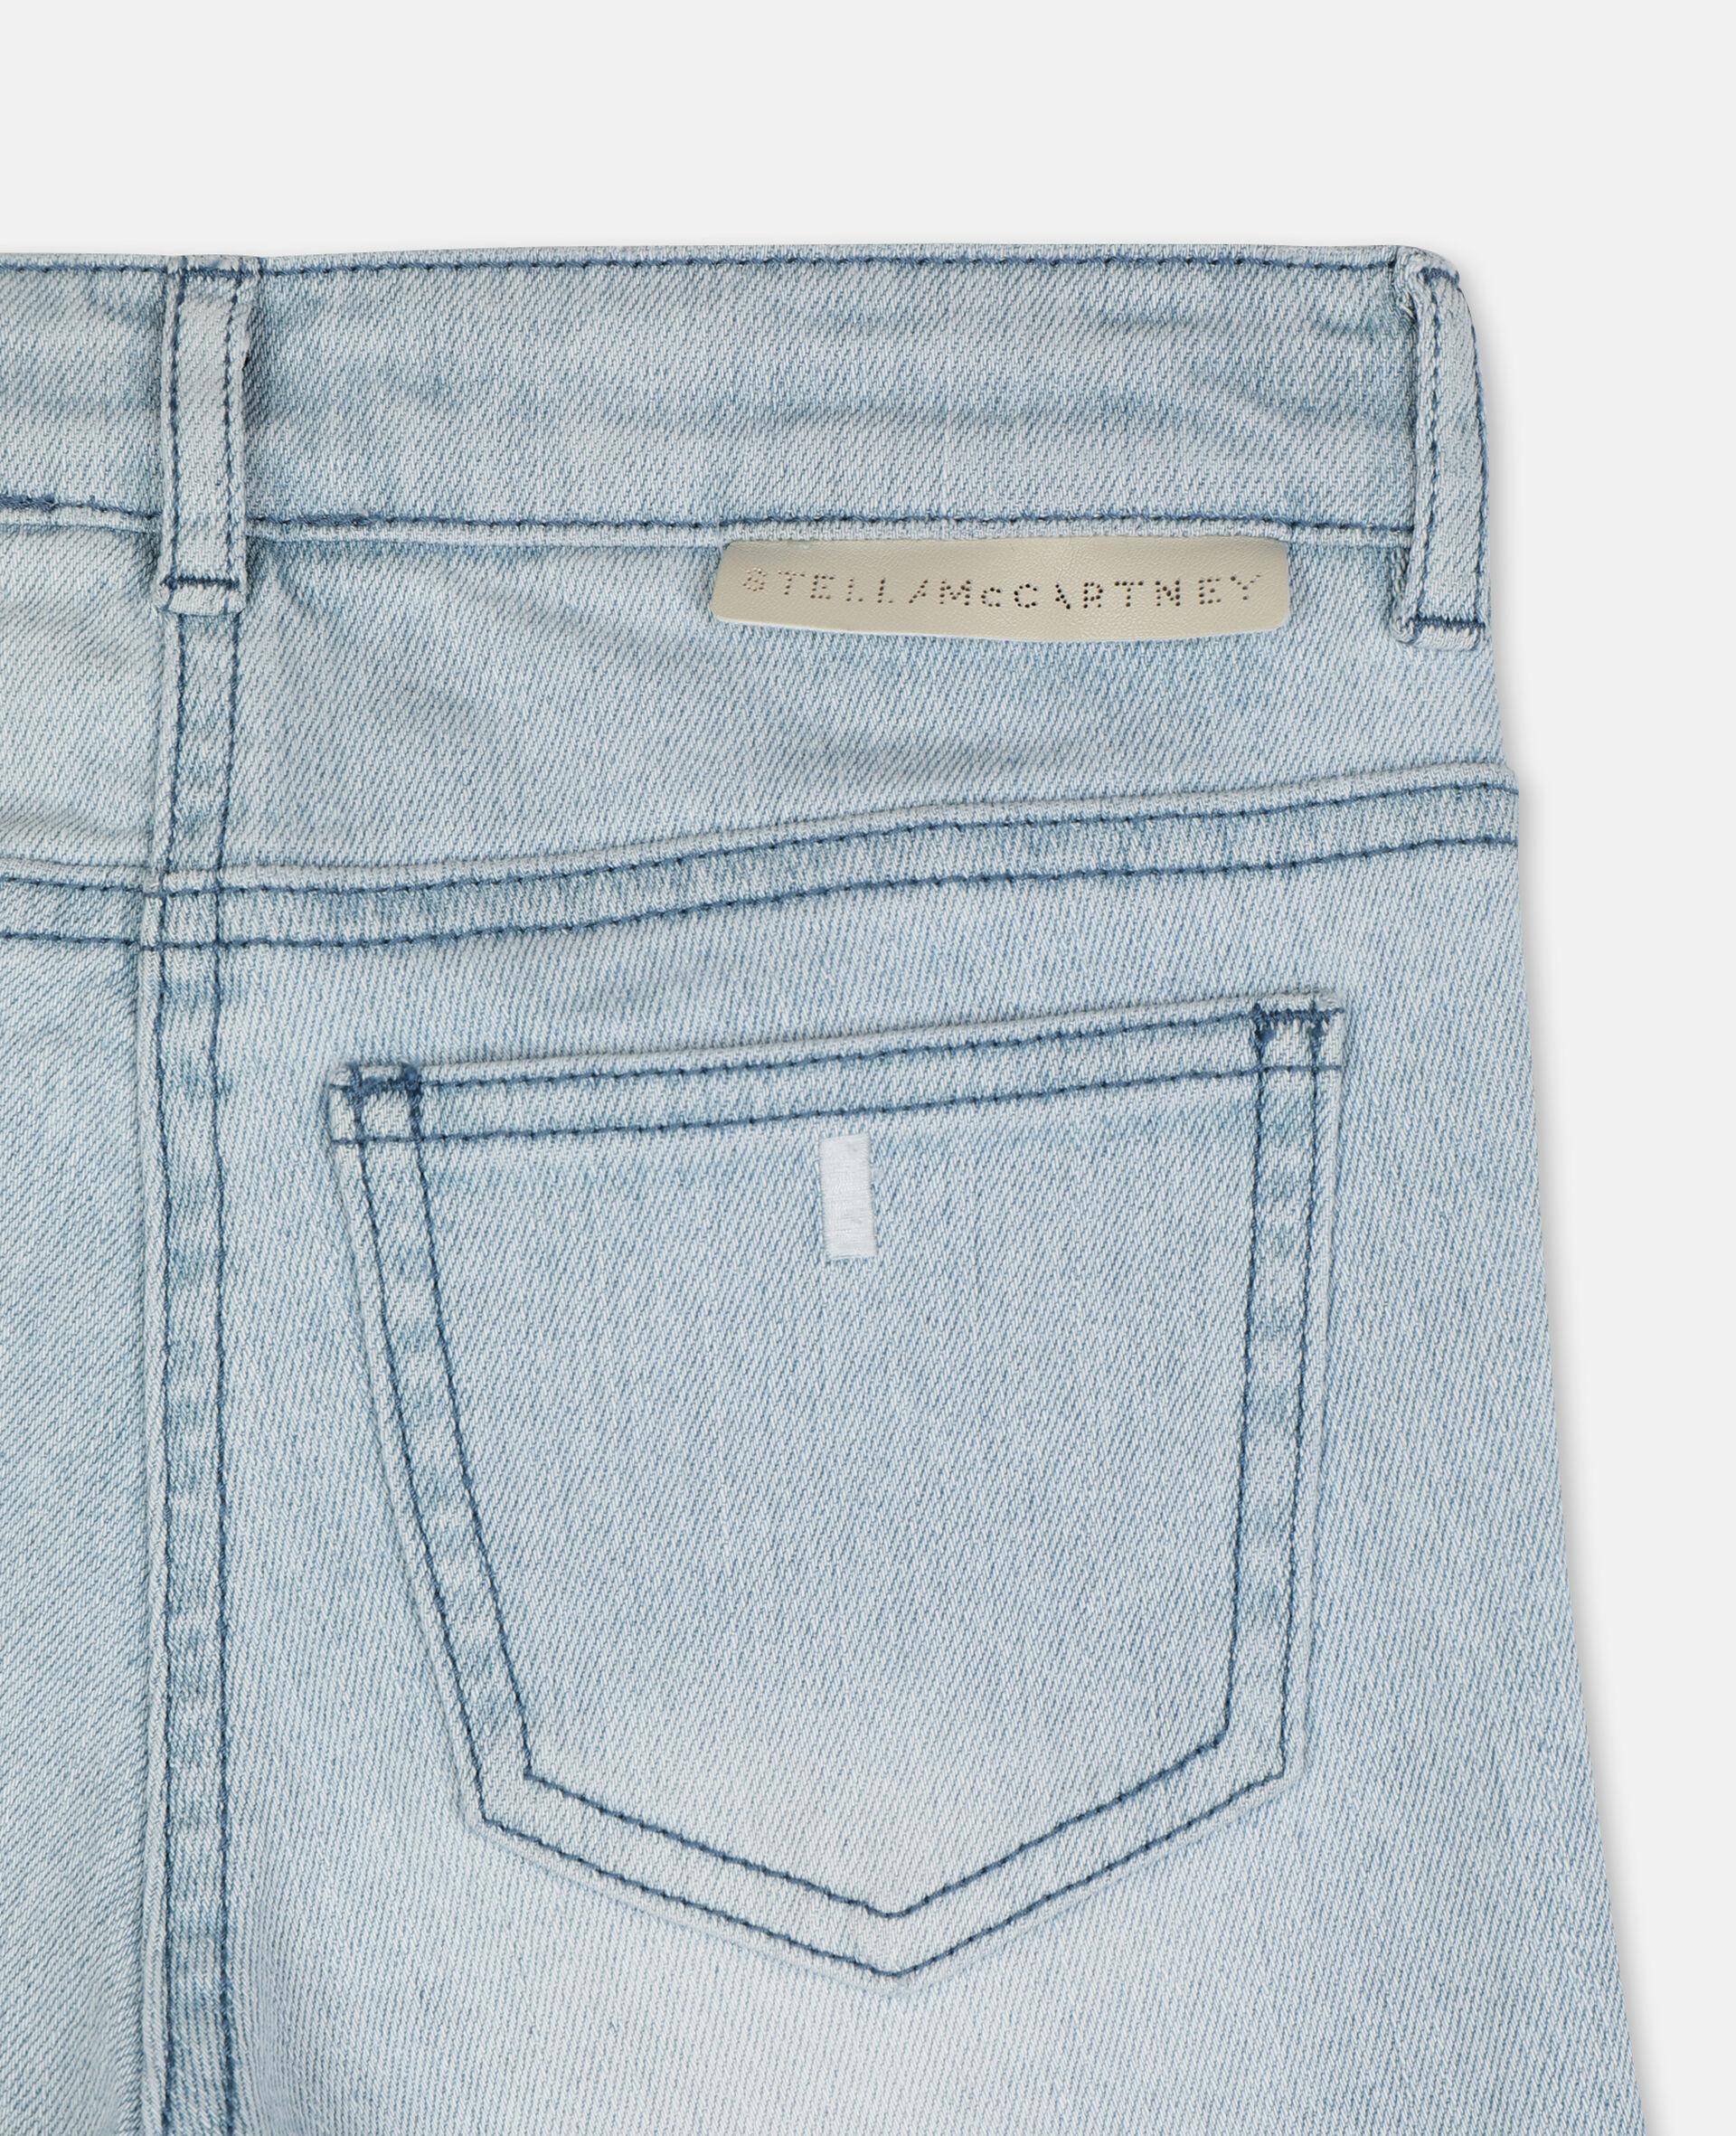 Skinny Denim Trousers-Blue-large image number 2